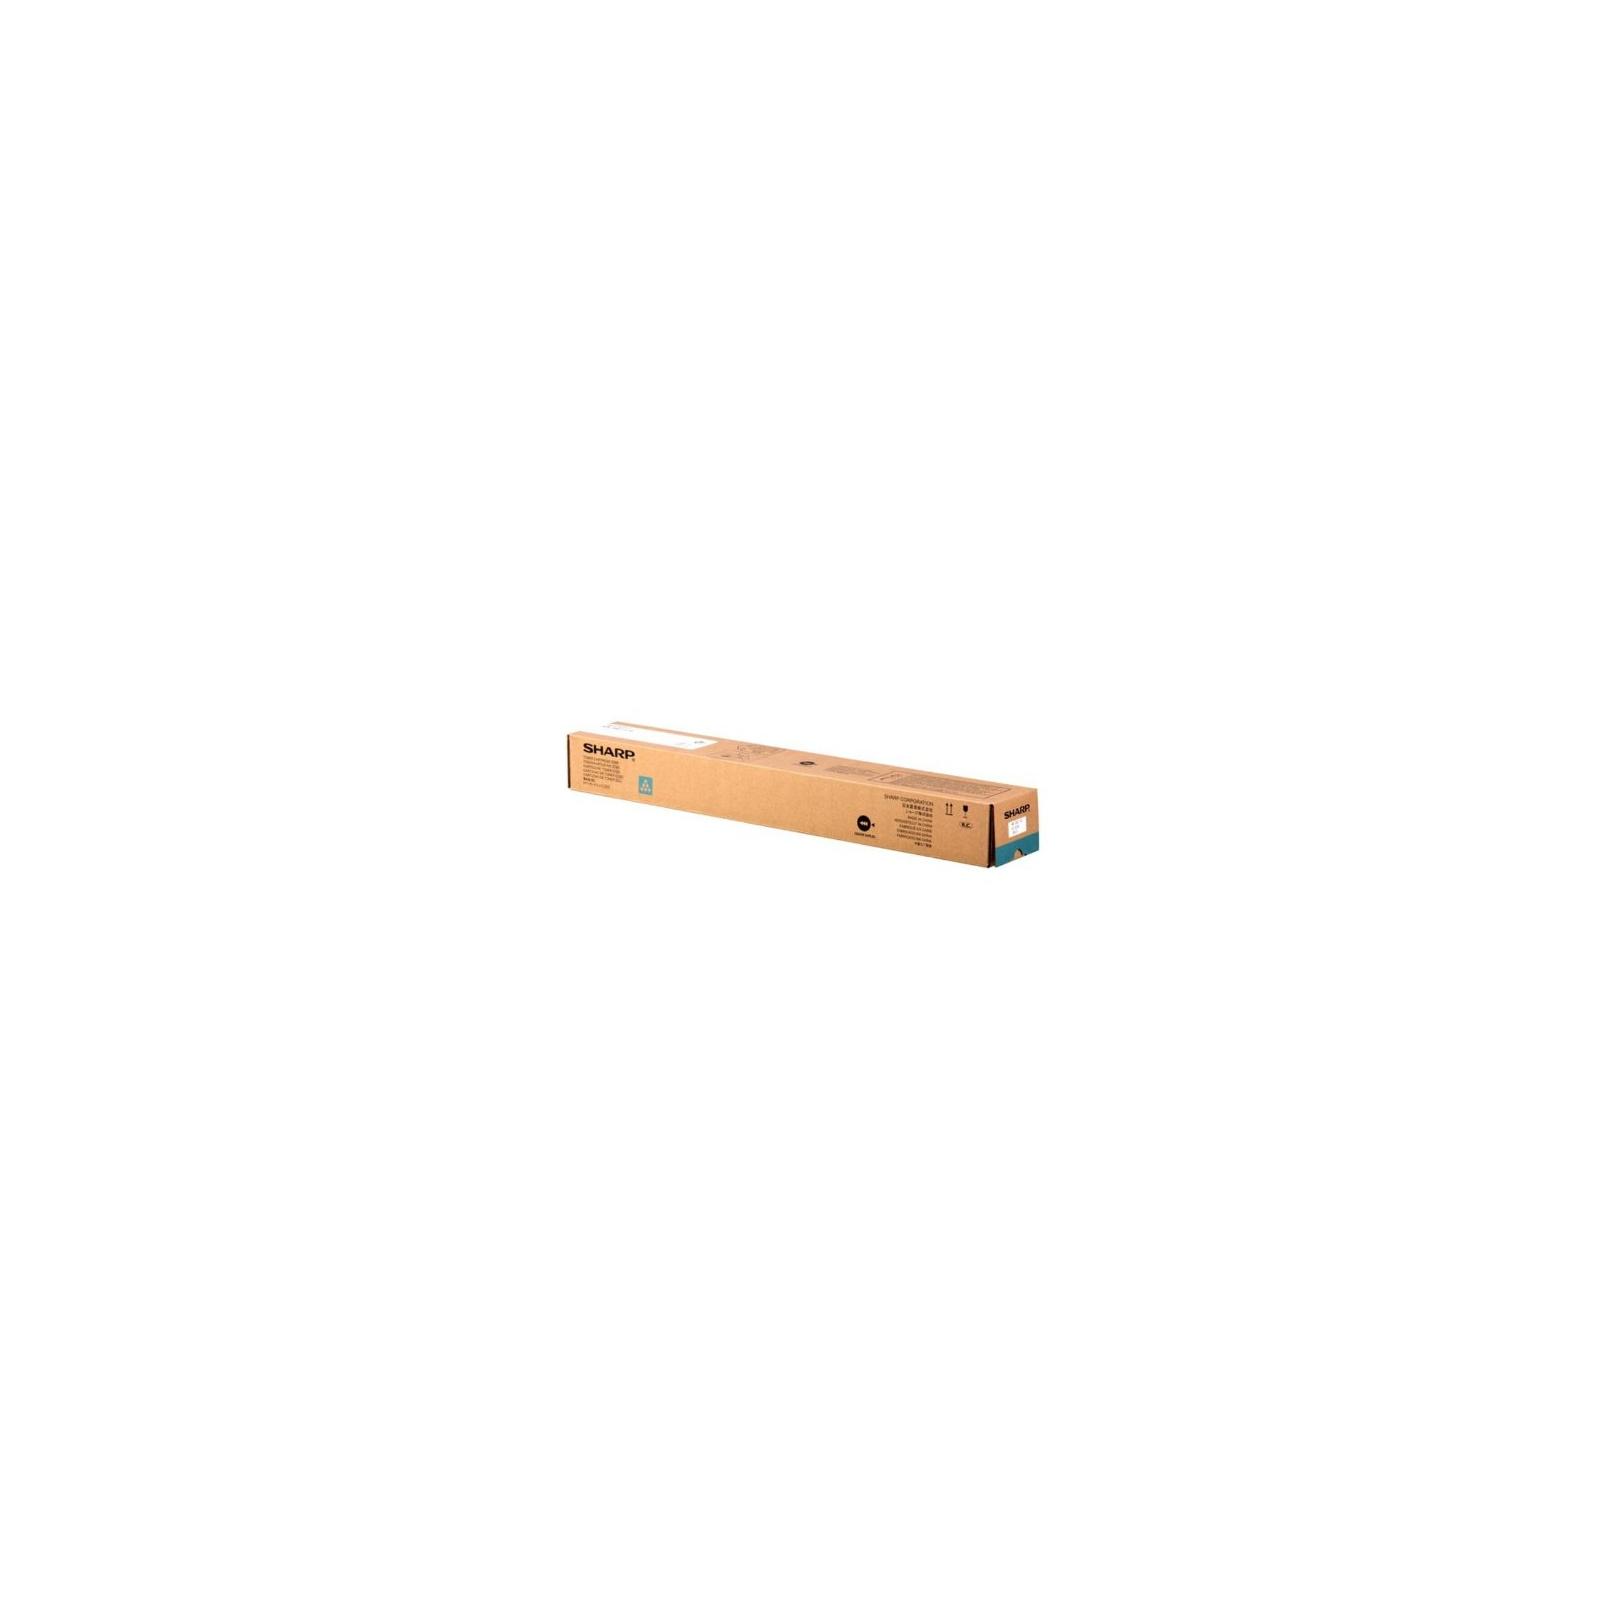 Оптический блок (Drum) SHARP MX36GR (BL100K/Color60K)MX2010/2310 (MX36GRSA)